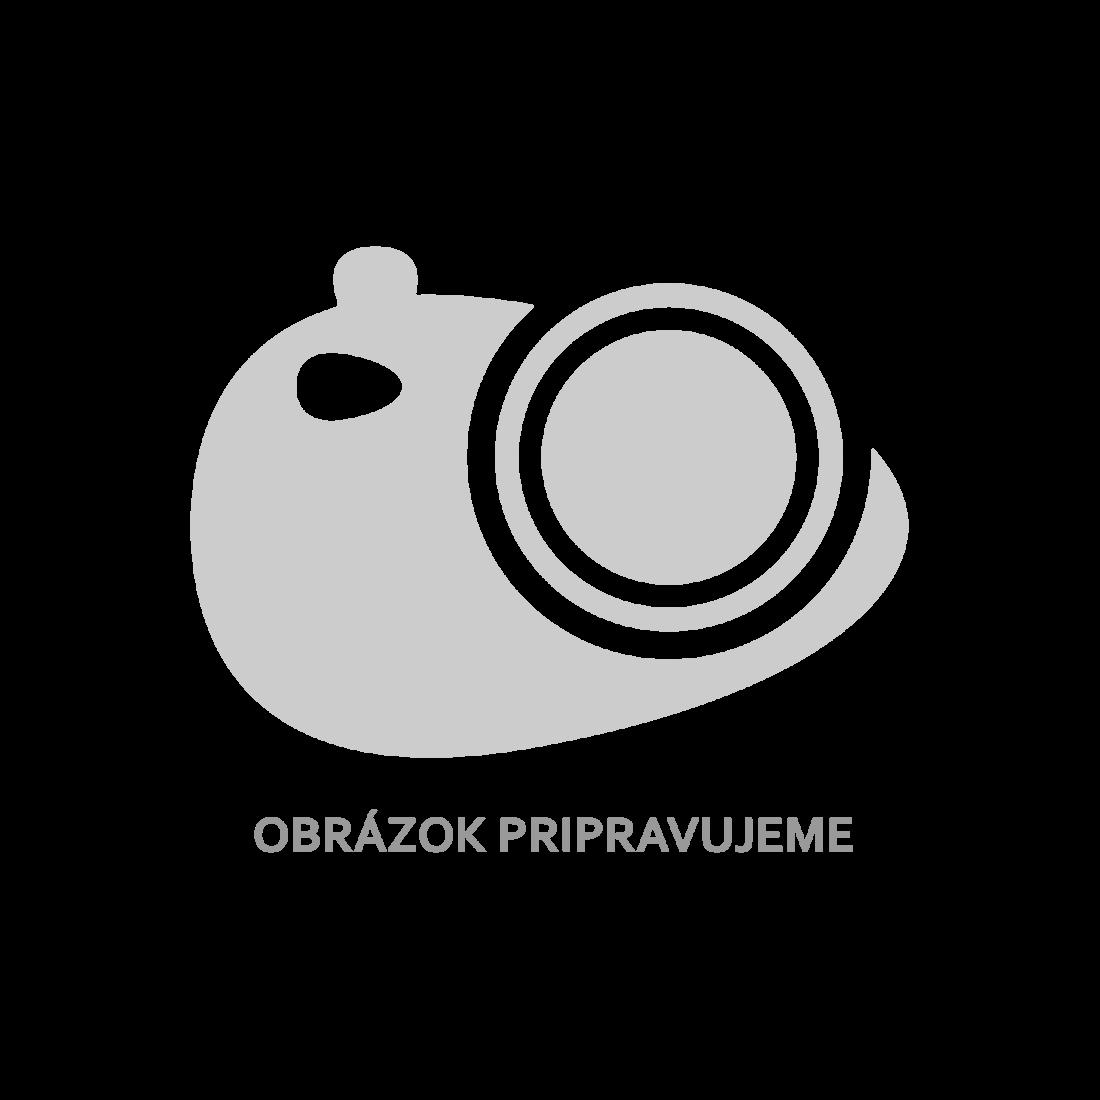 vidaXL Taburet s potiskem růžový 45 x 45 x 45 cm bavlna [287582]